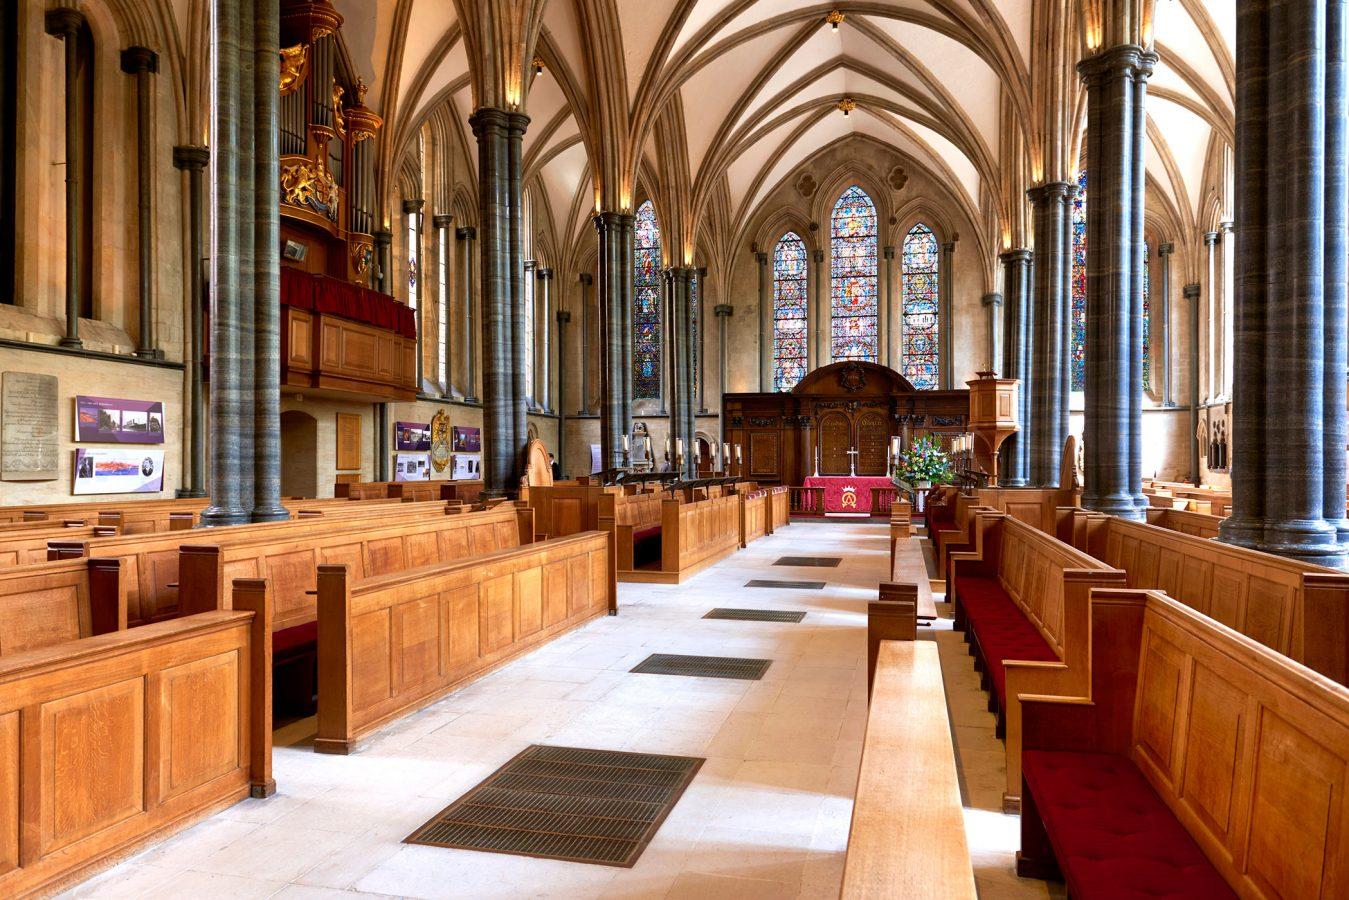 The Knights Templar Church